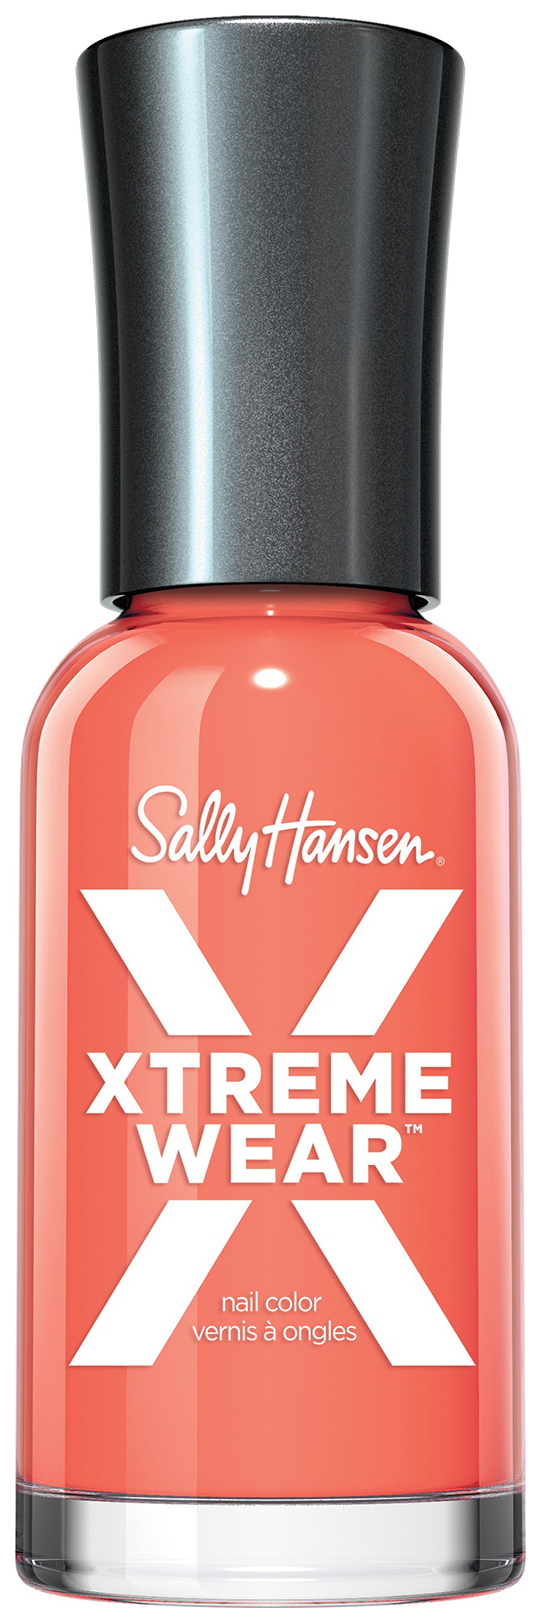 Купить Лак для ногтей Sally Hansen Xtreme Wear Nail Color 328 Pixie Peach 11, 8 мл